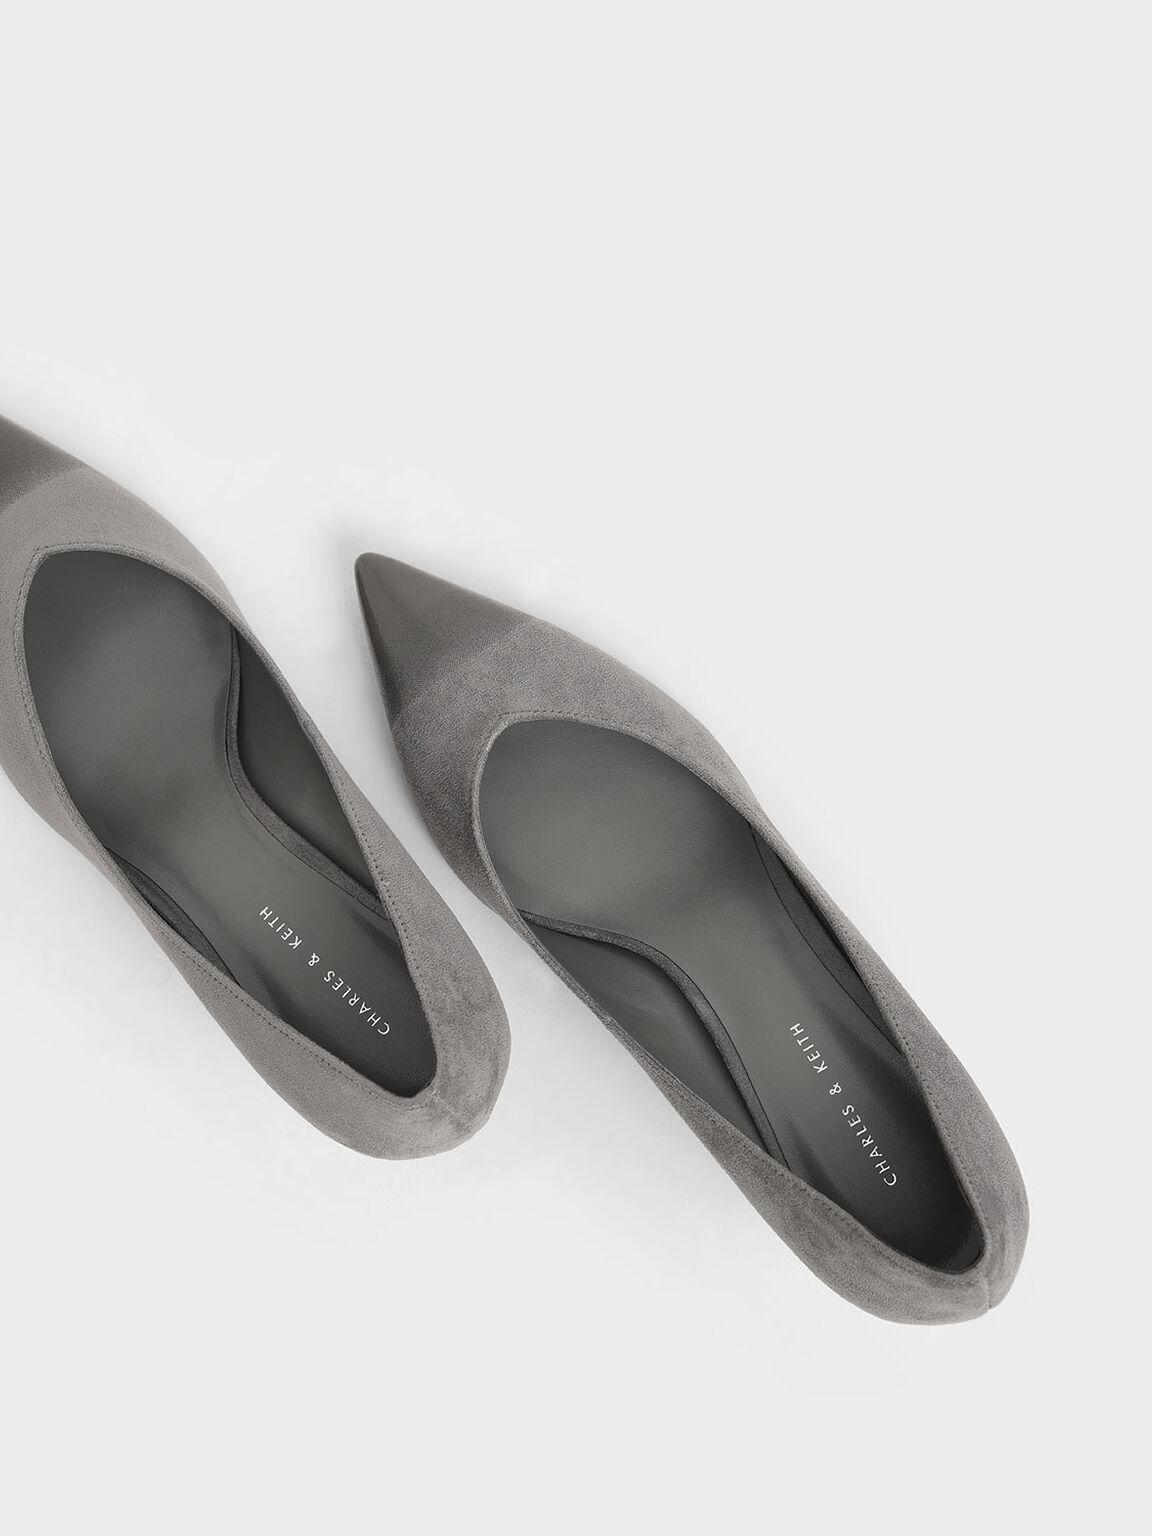 Brushed Effect Textured Sculptural Heel Pumps, Grey, hi-res